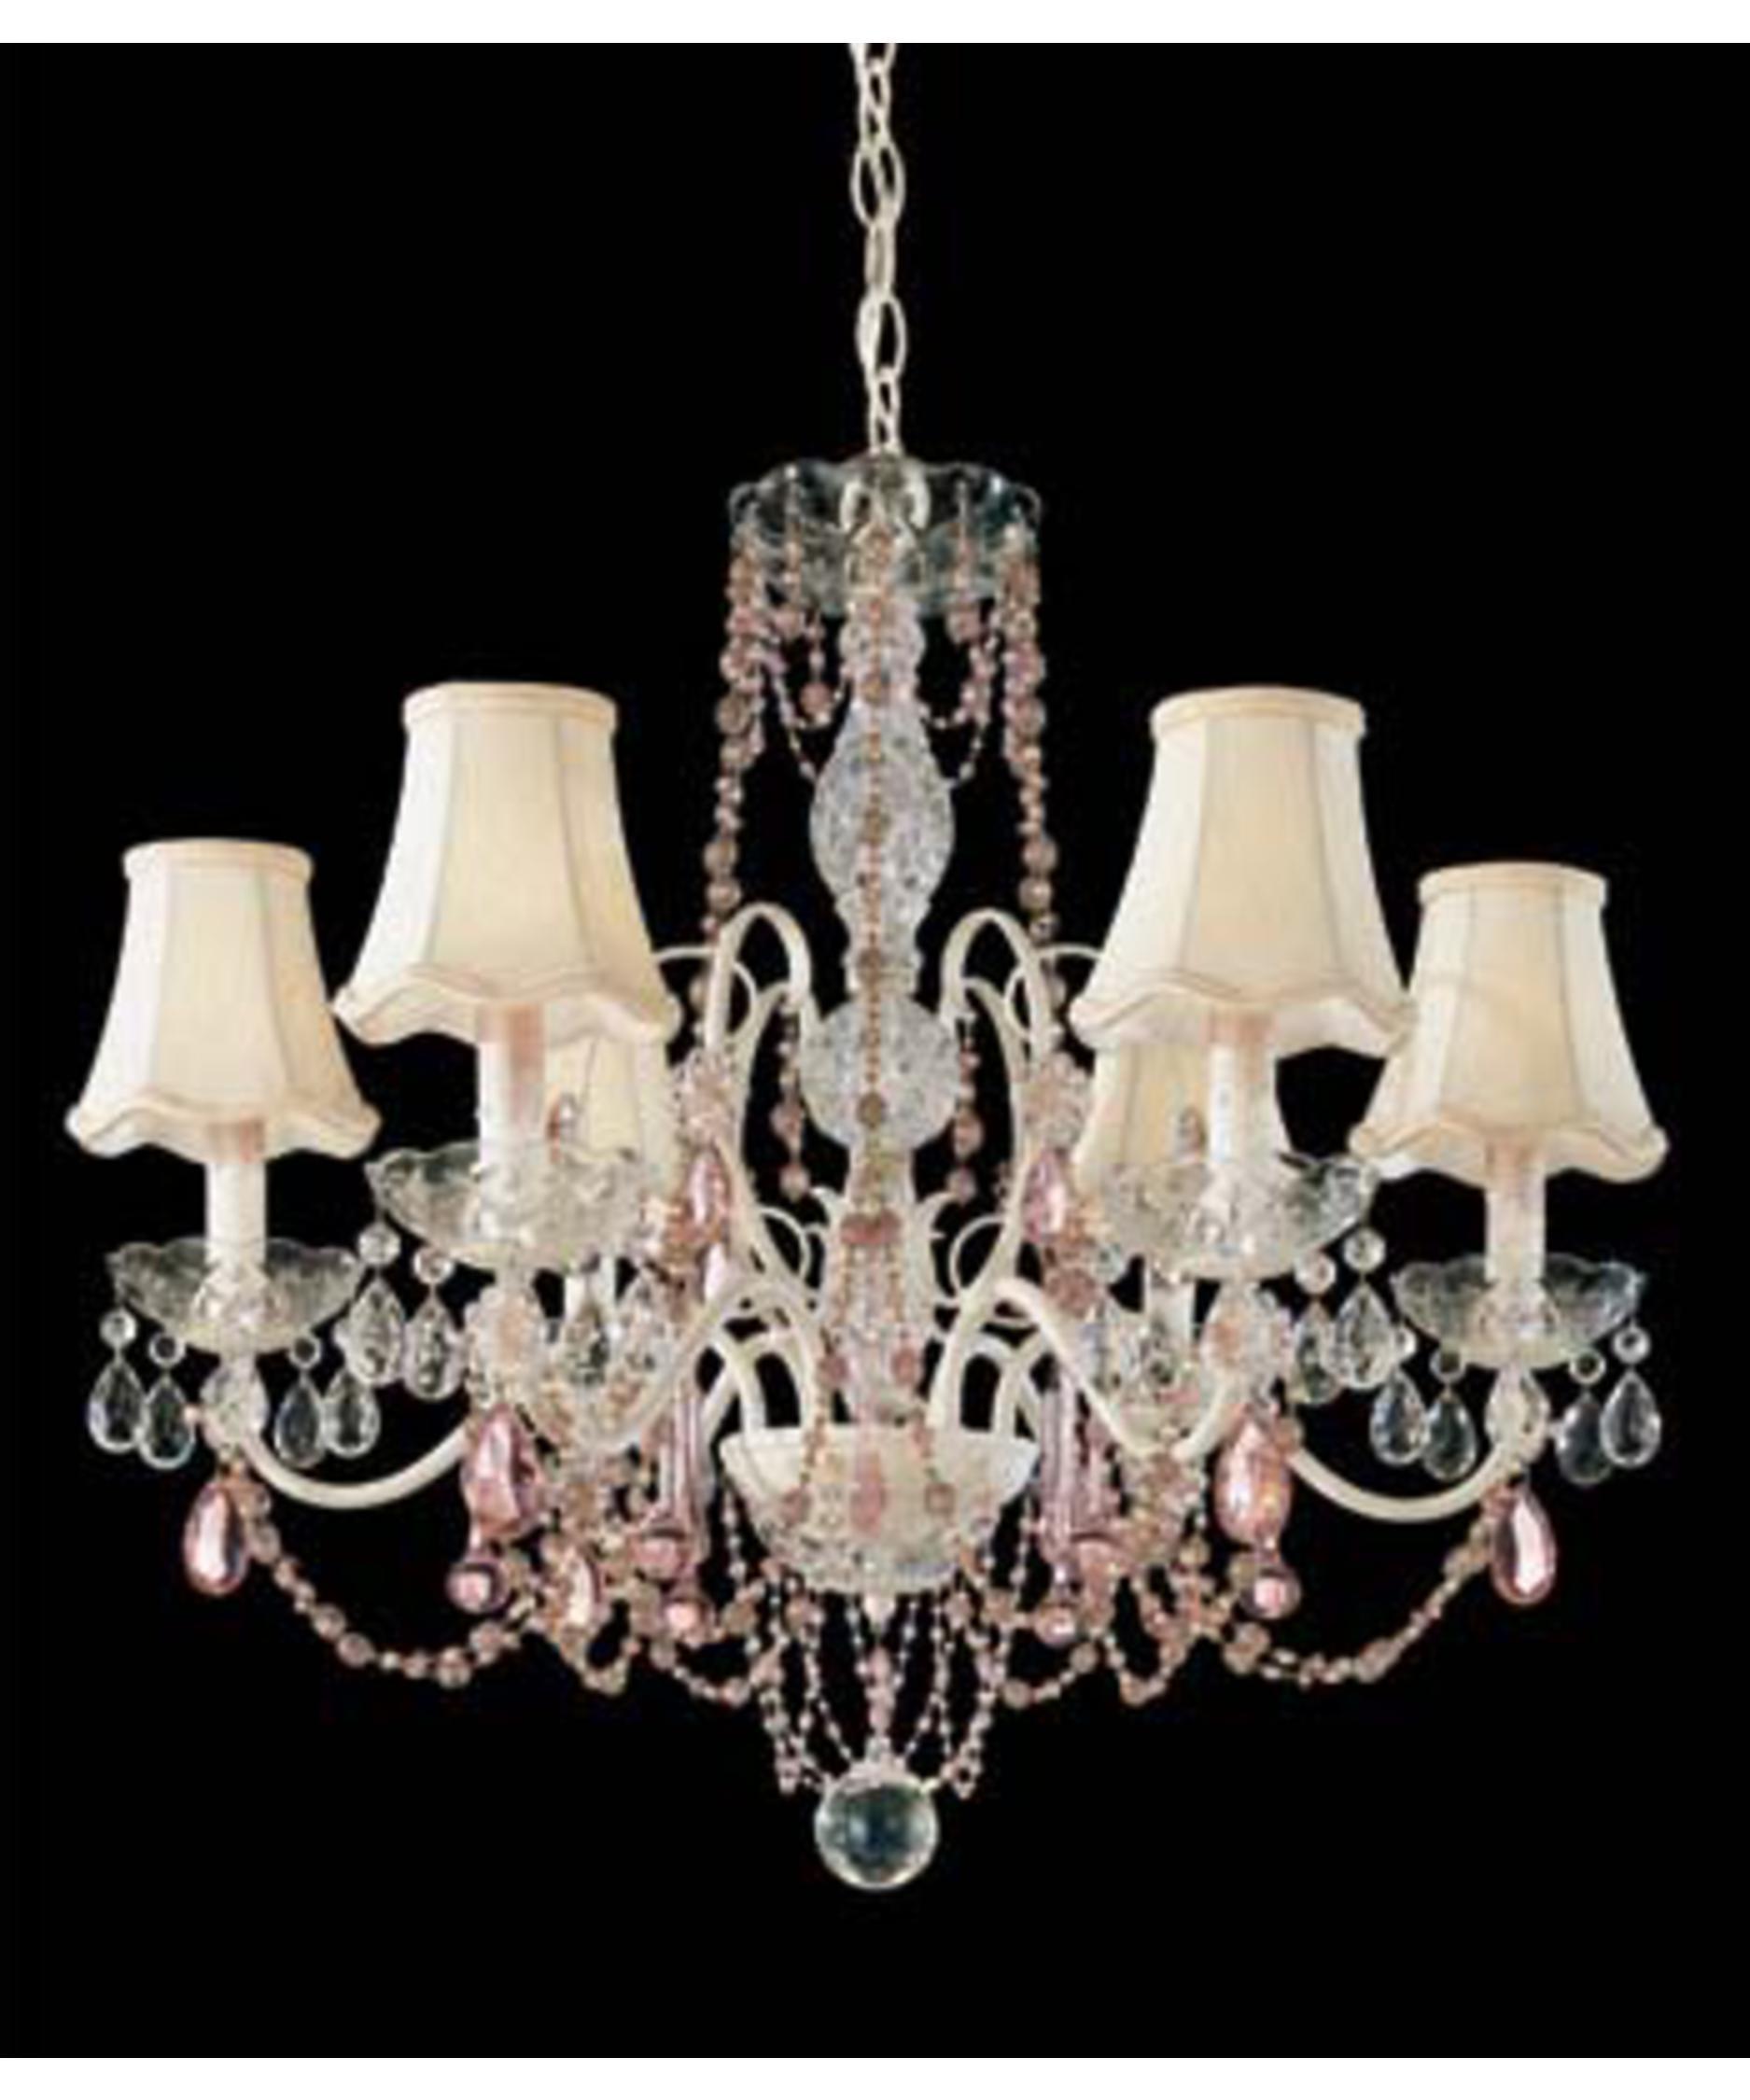 schonbek a la mode 25 inch wide 6 light chandelier capitol lighting - Schonbek